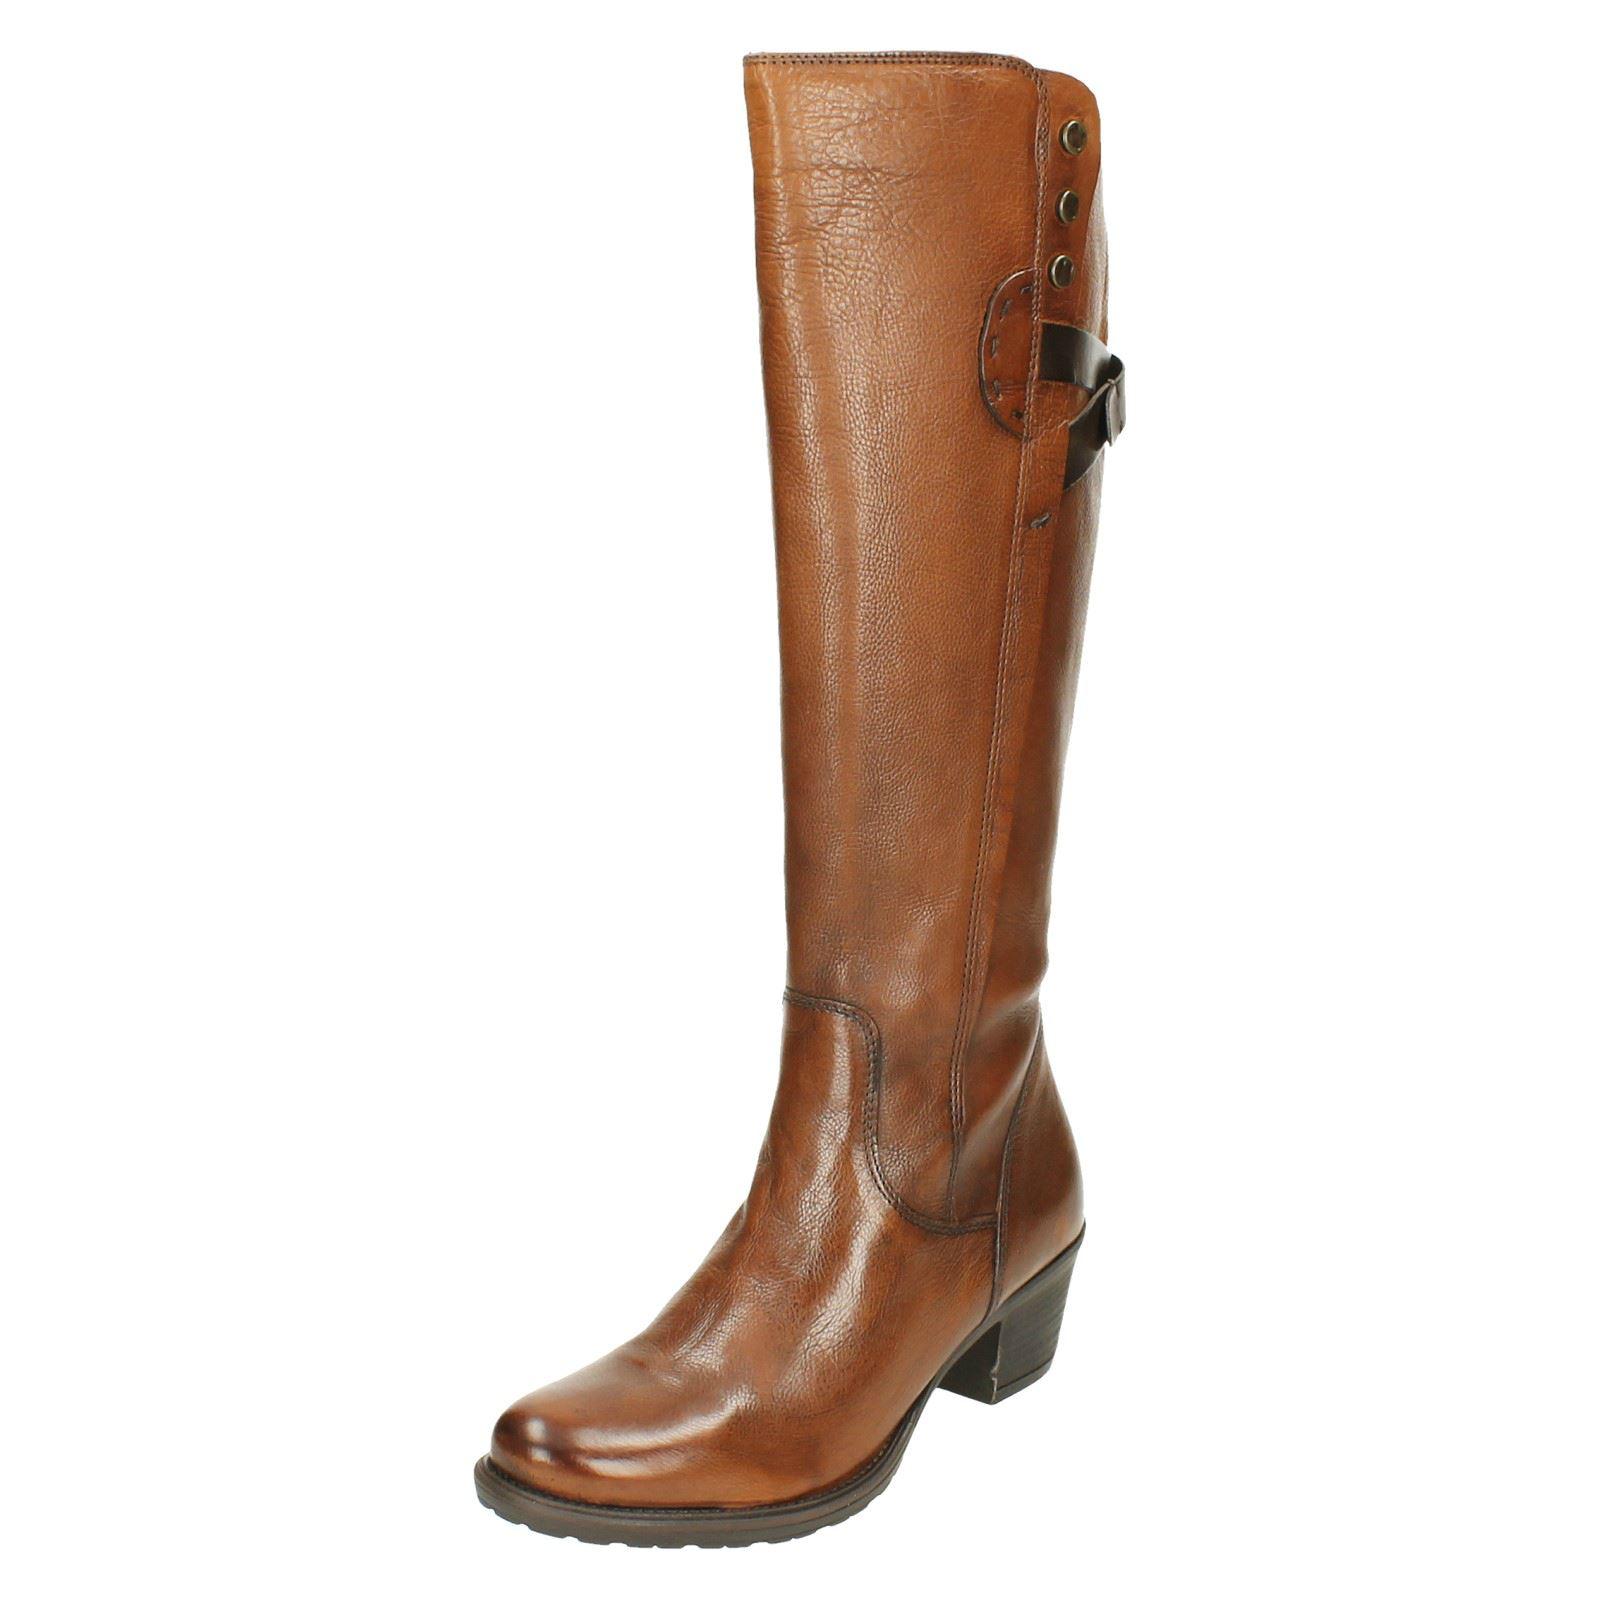 Ladies Clarks Riding Style Boots Maymie Stellar